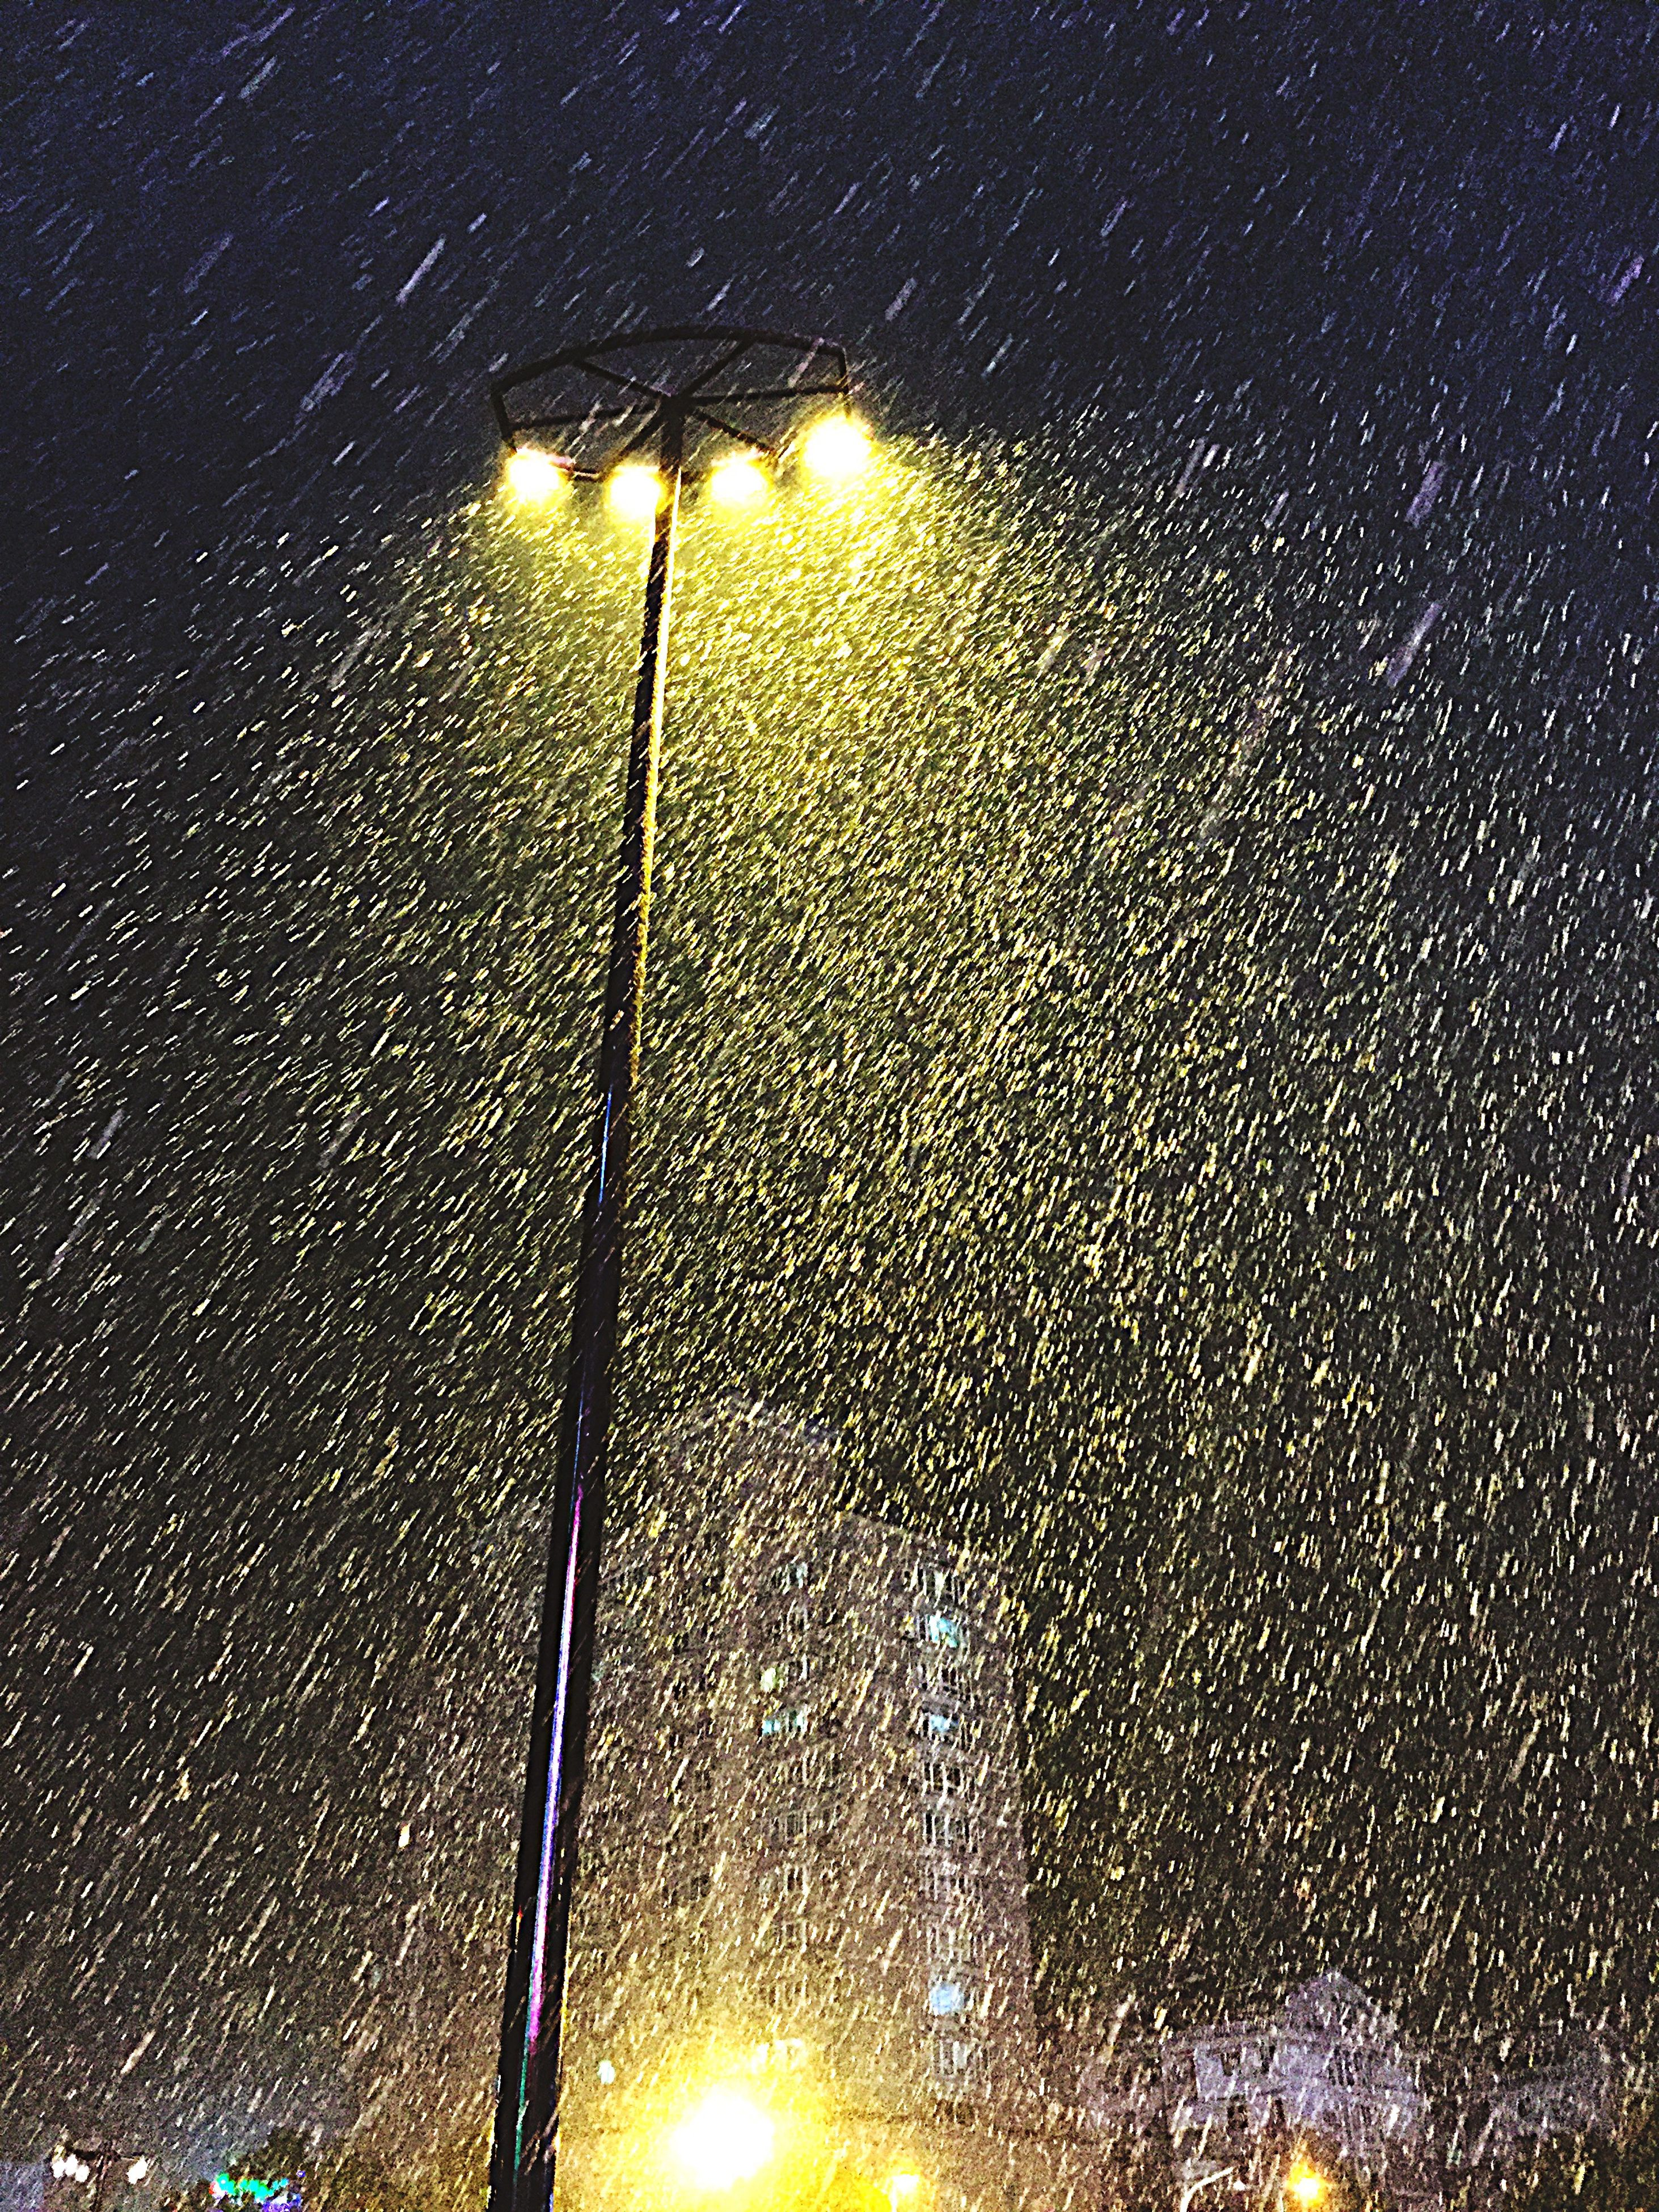 wet, water, night, drop, rain, illuminated, street light, sky, raindrop, season, lighting equipment, no people, sunset, nature, reflection, weather, silhouette, electricity, street, glowing